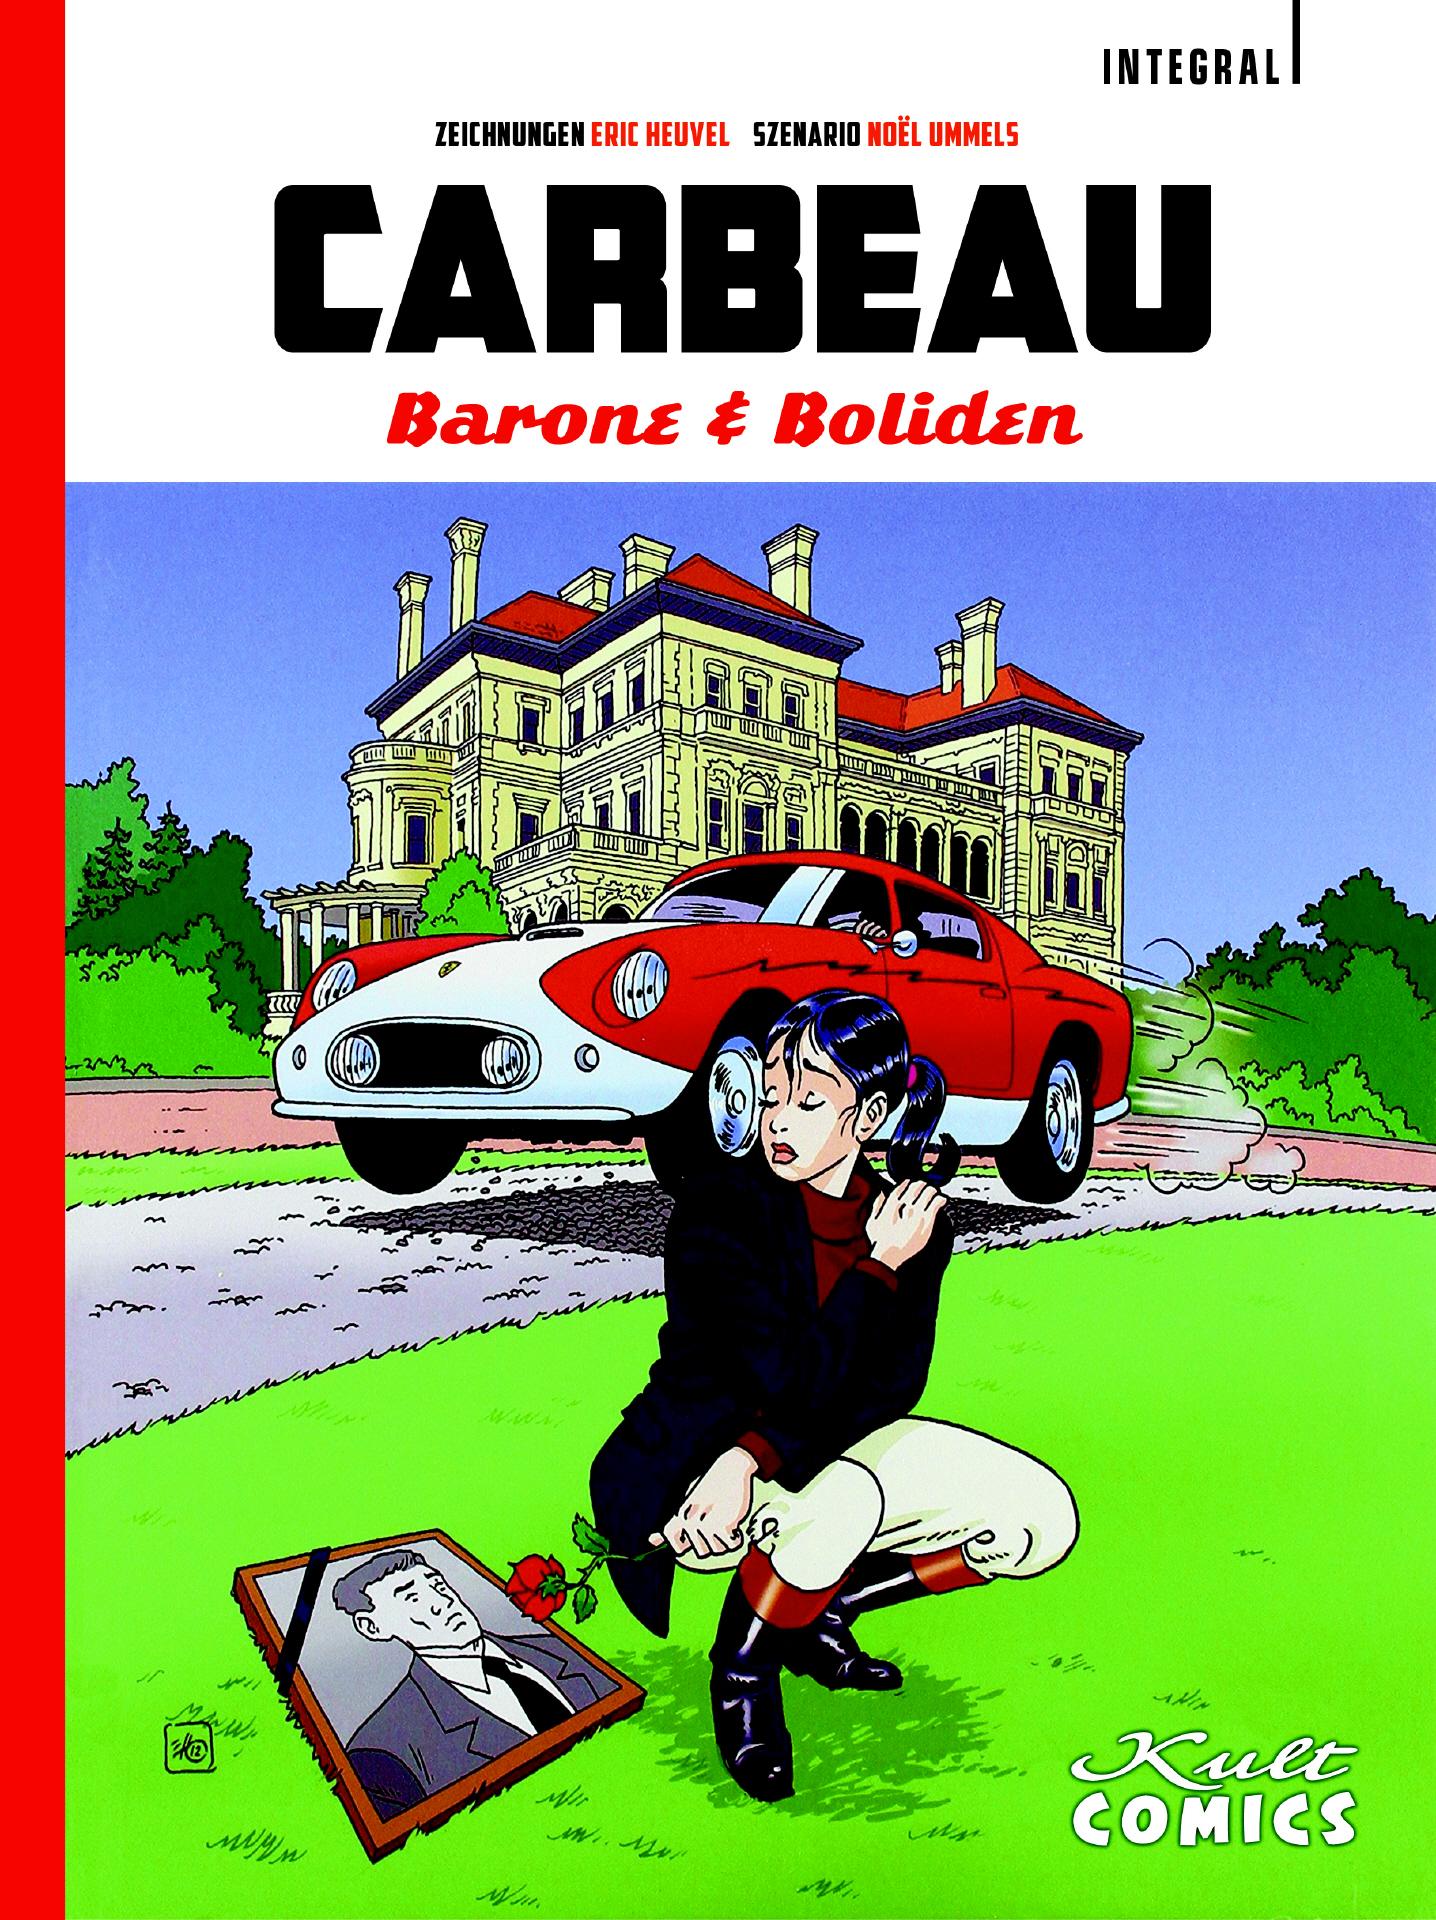 Fantastic Screen Blu ray DVD Comic Filme Stars und Sternchen